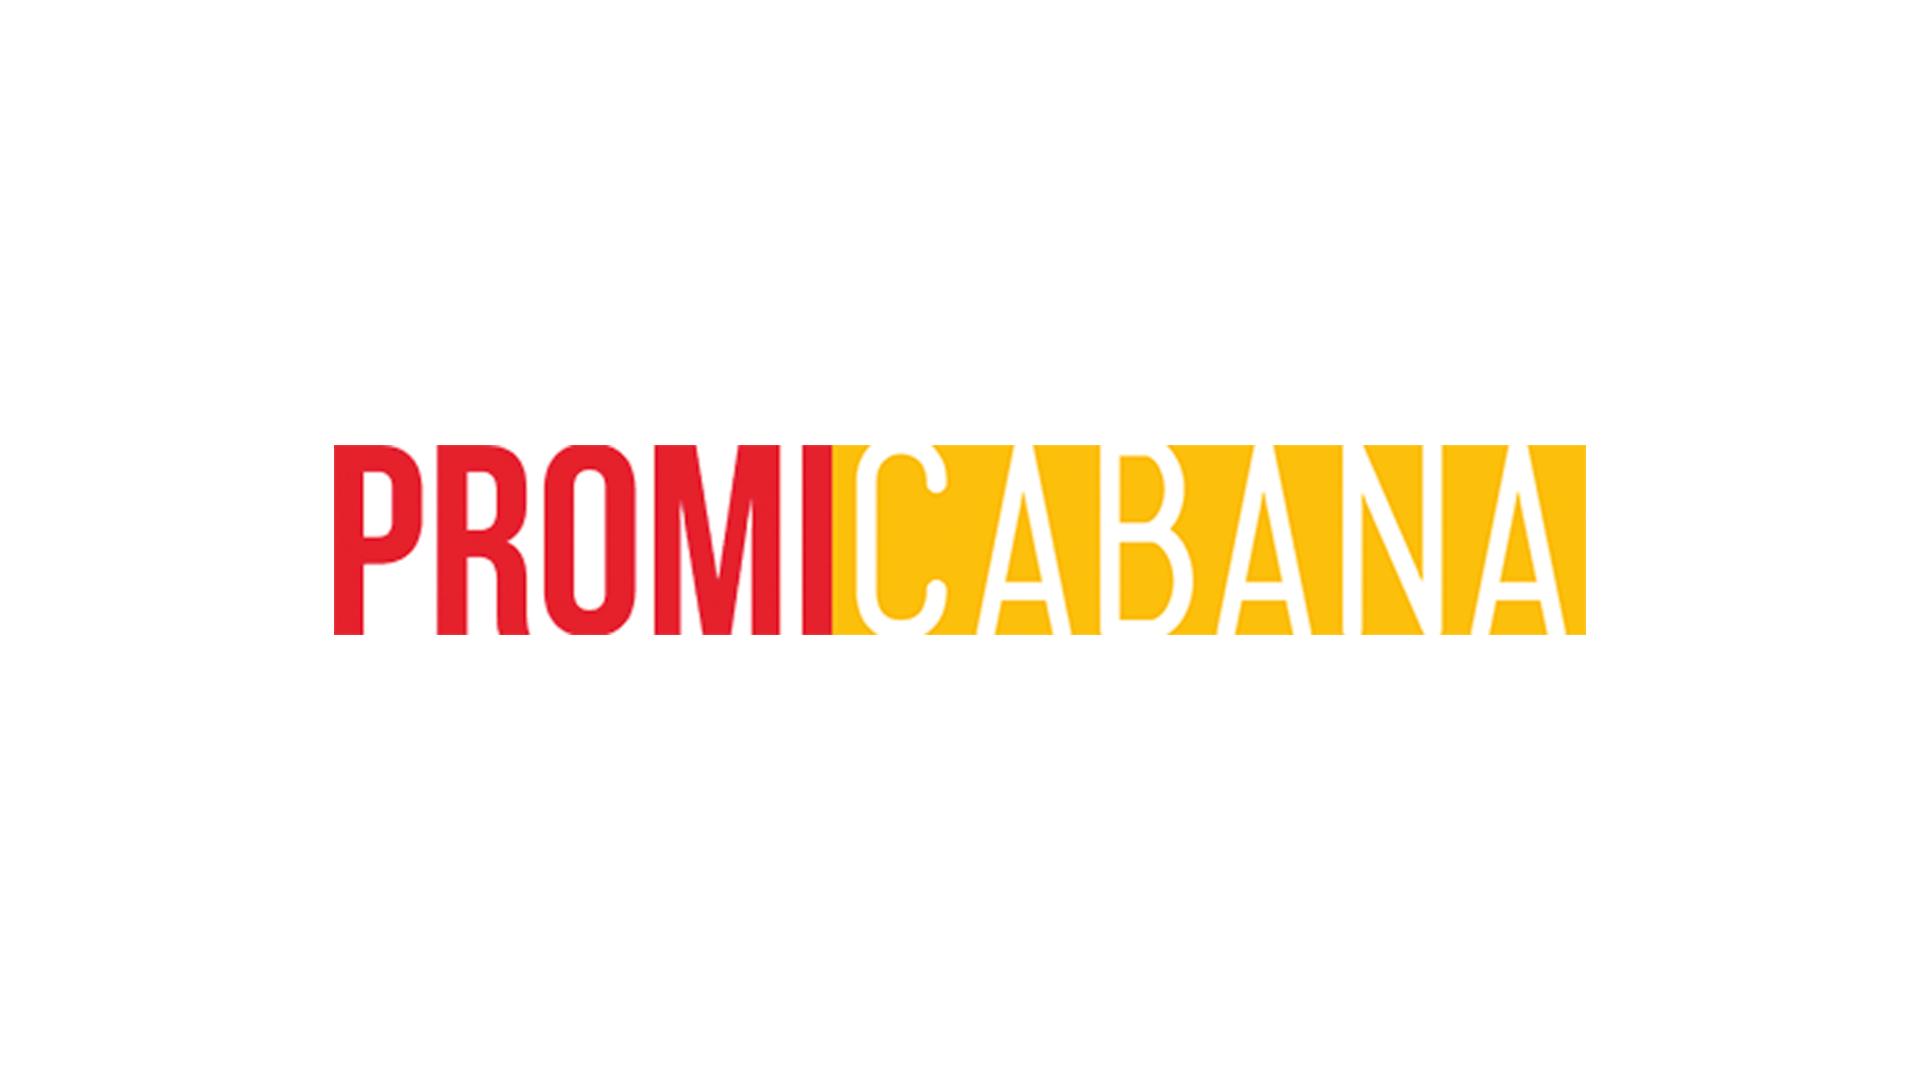 Miley-Cyrus-Jimmy-Kimmel-Lonesome